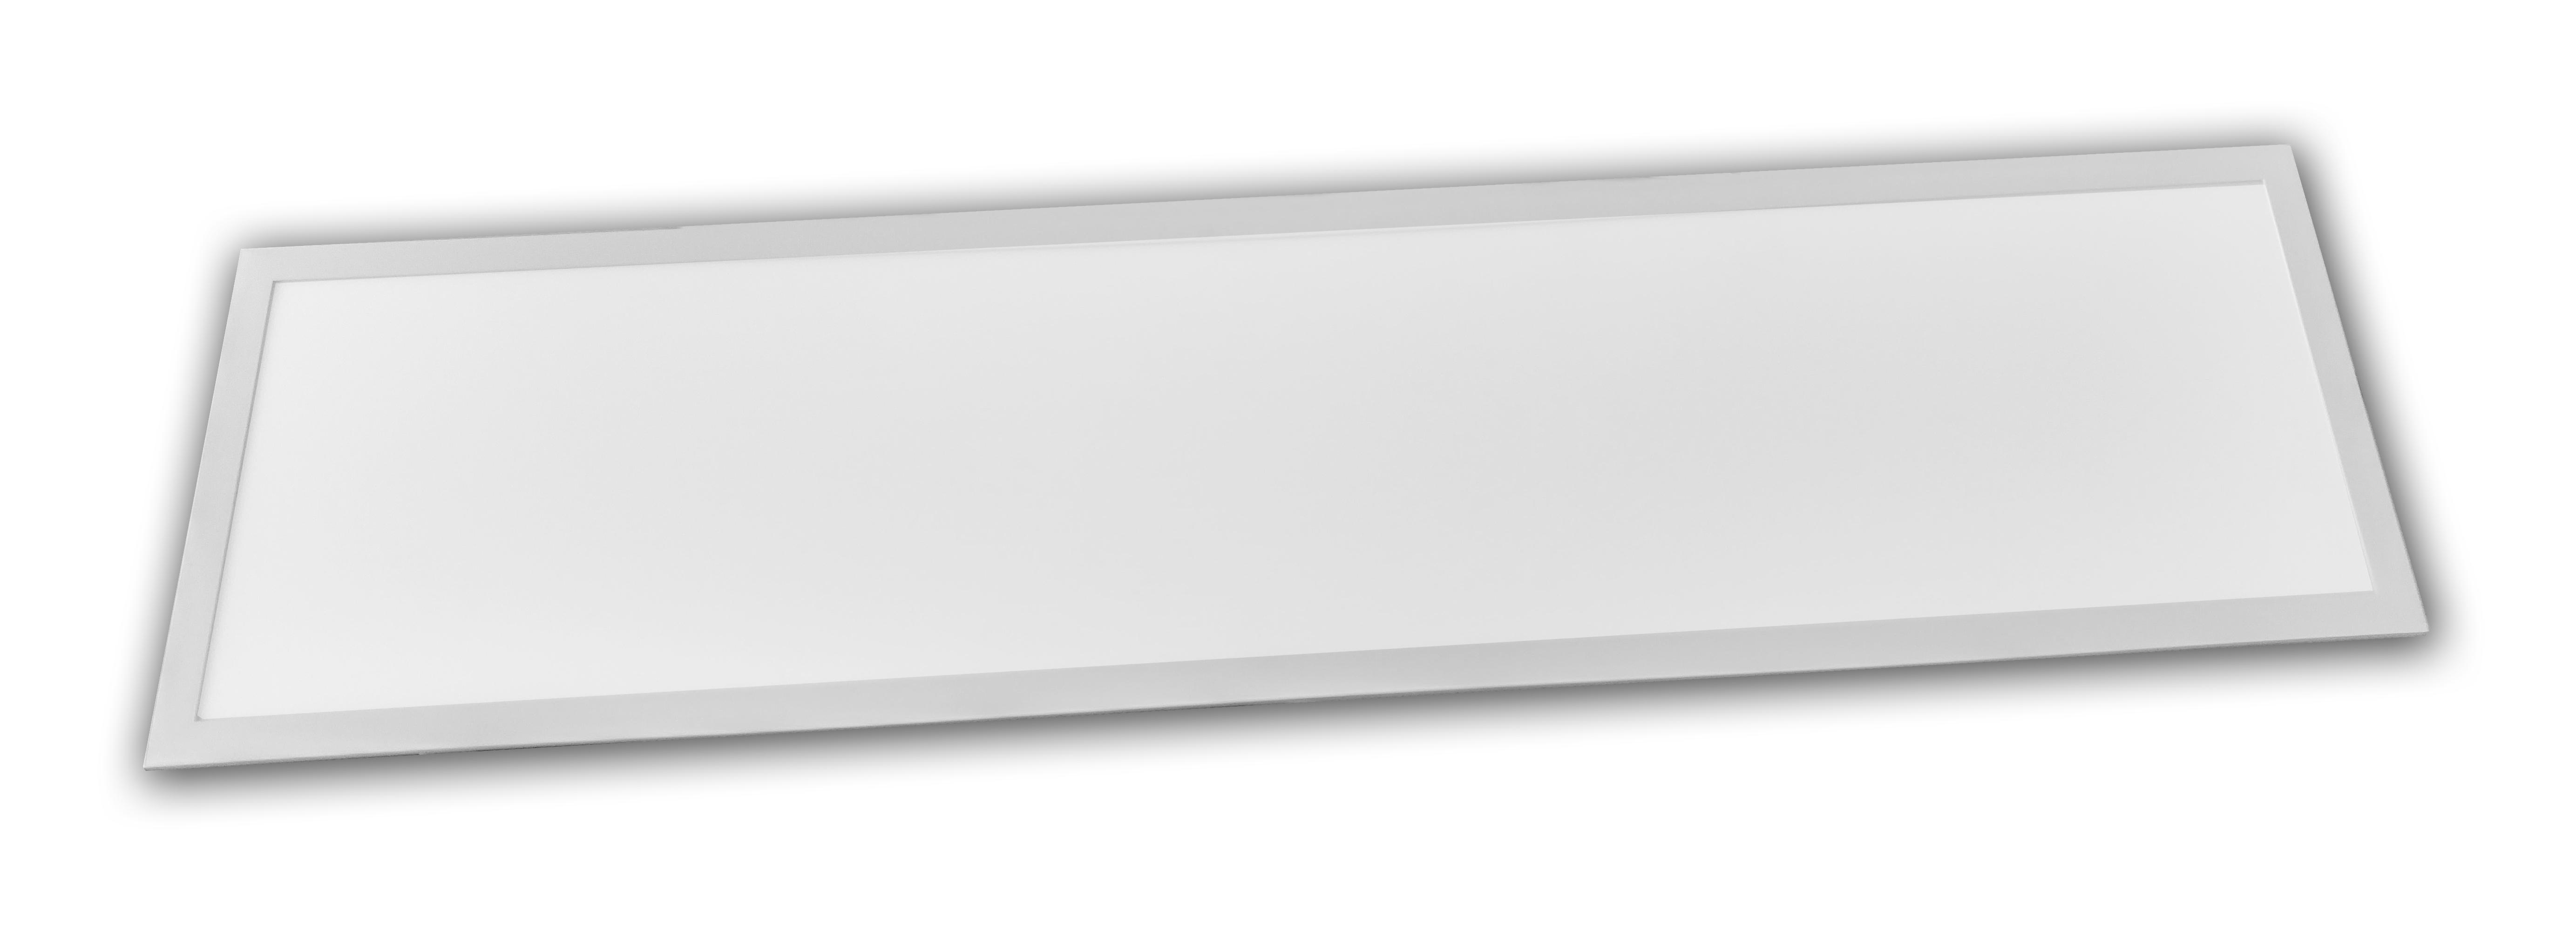 LED panel DAISY VIRGO II 40W NW/840 WF GREENLUX (GXDS079)